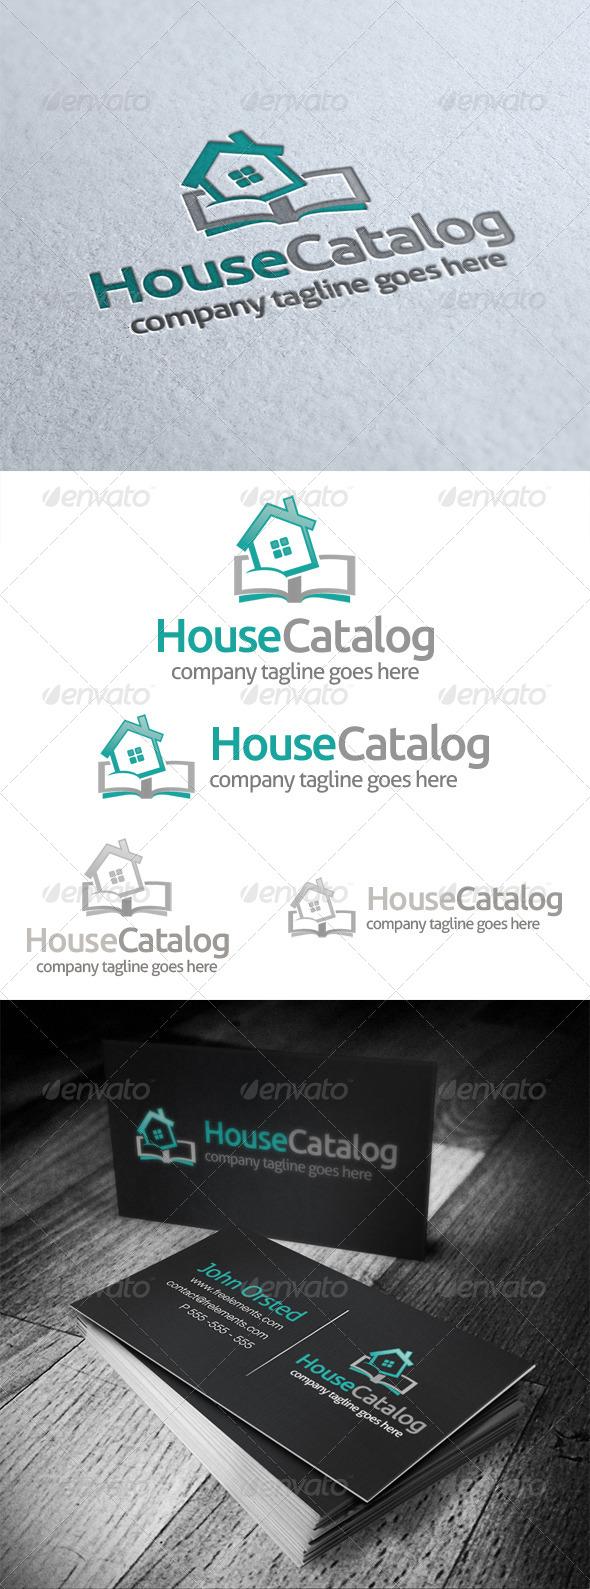 House Catalog Logo - Buildings Logo Templates